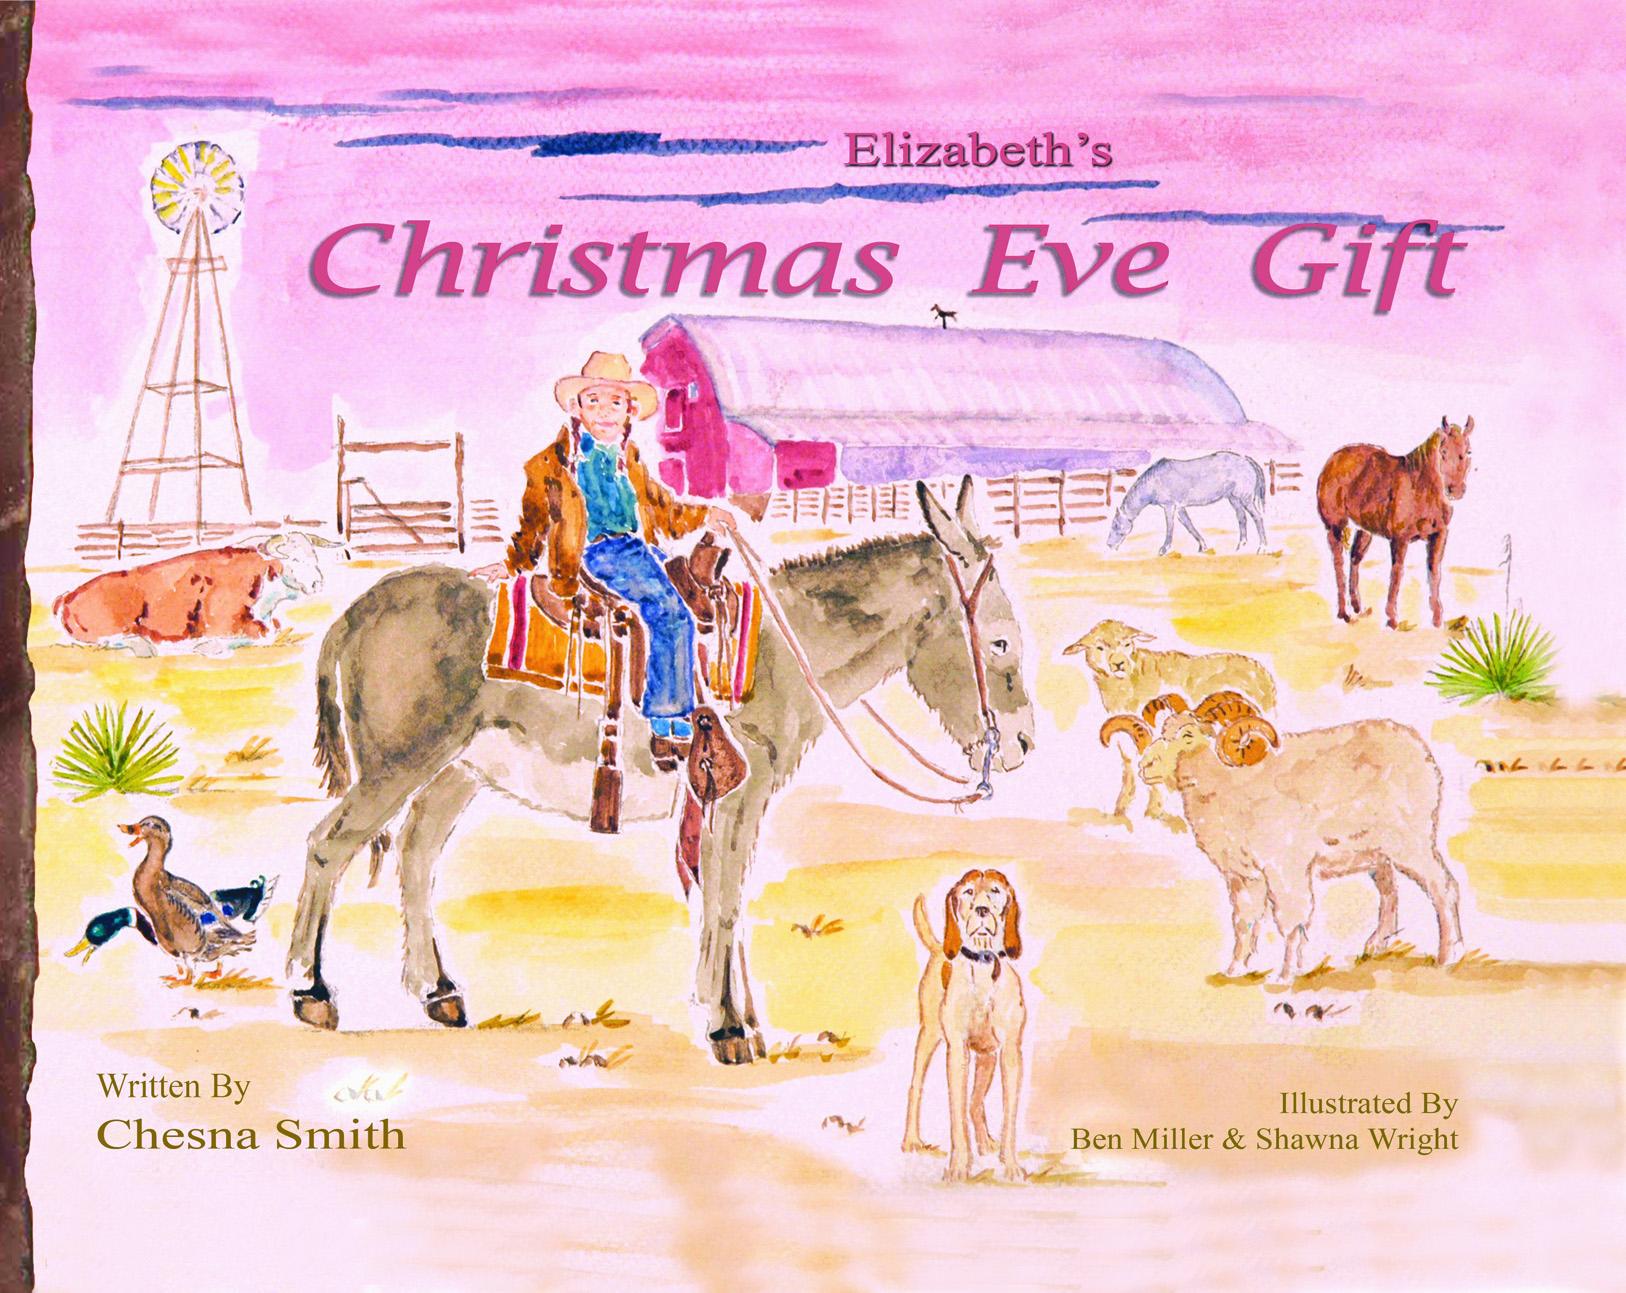 elizabeths christmas eve gift